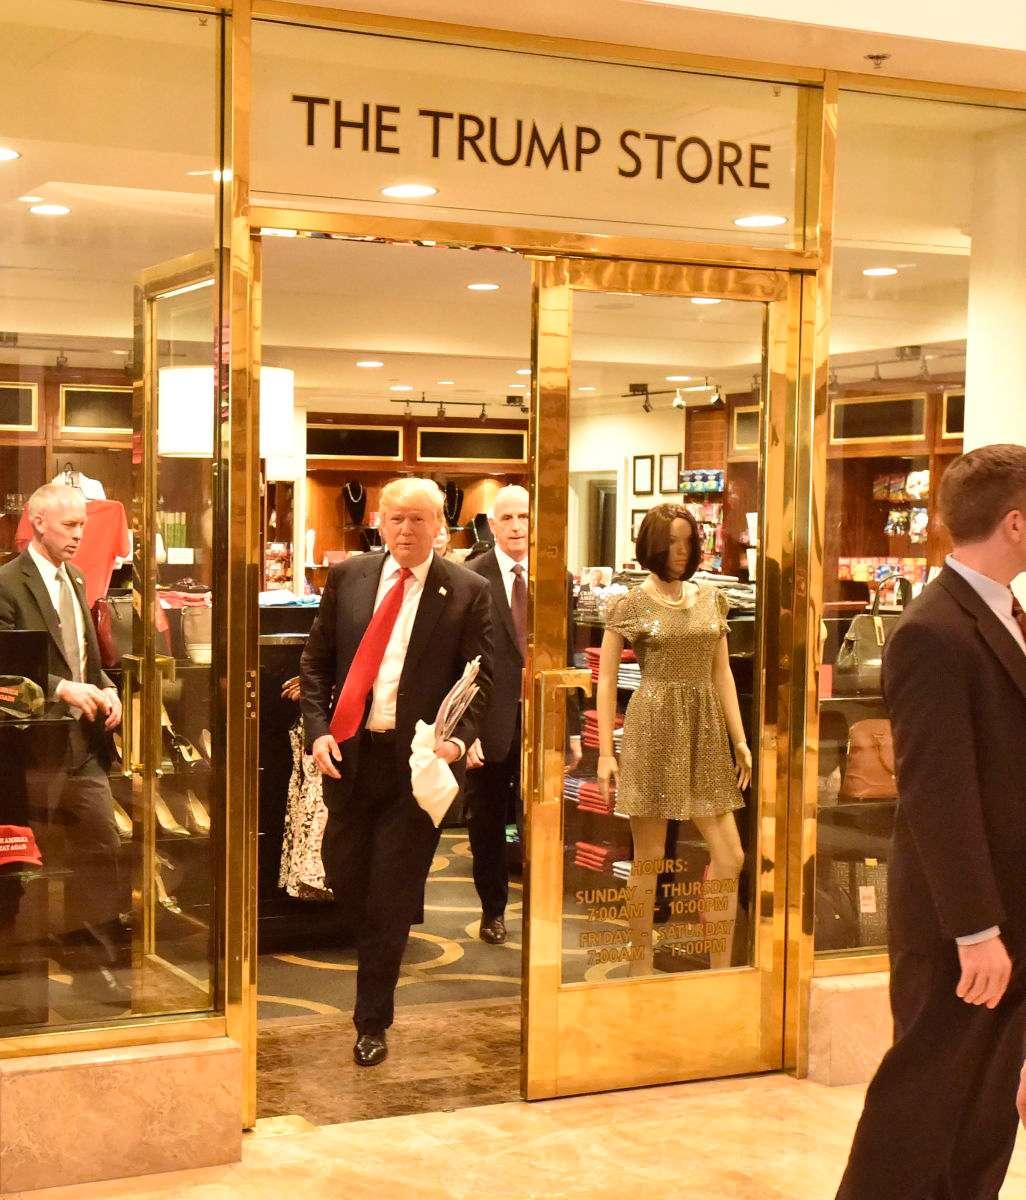 President Elect Donald Trump departs the Trump Store inside the Trump Hotel in Las Vegas, NV.